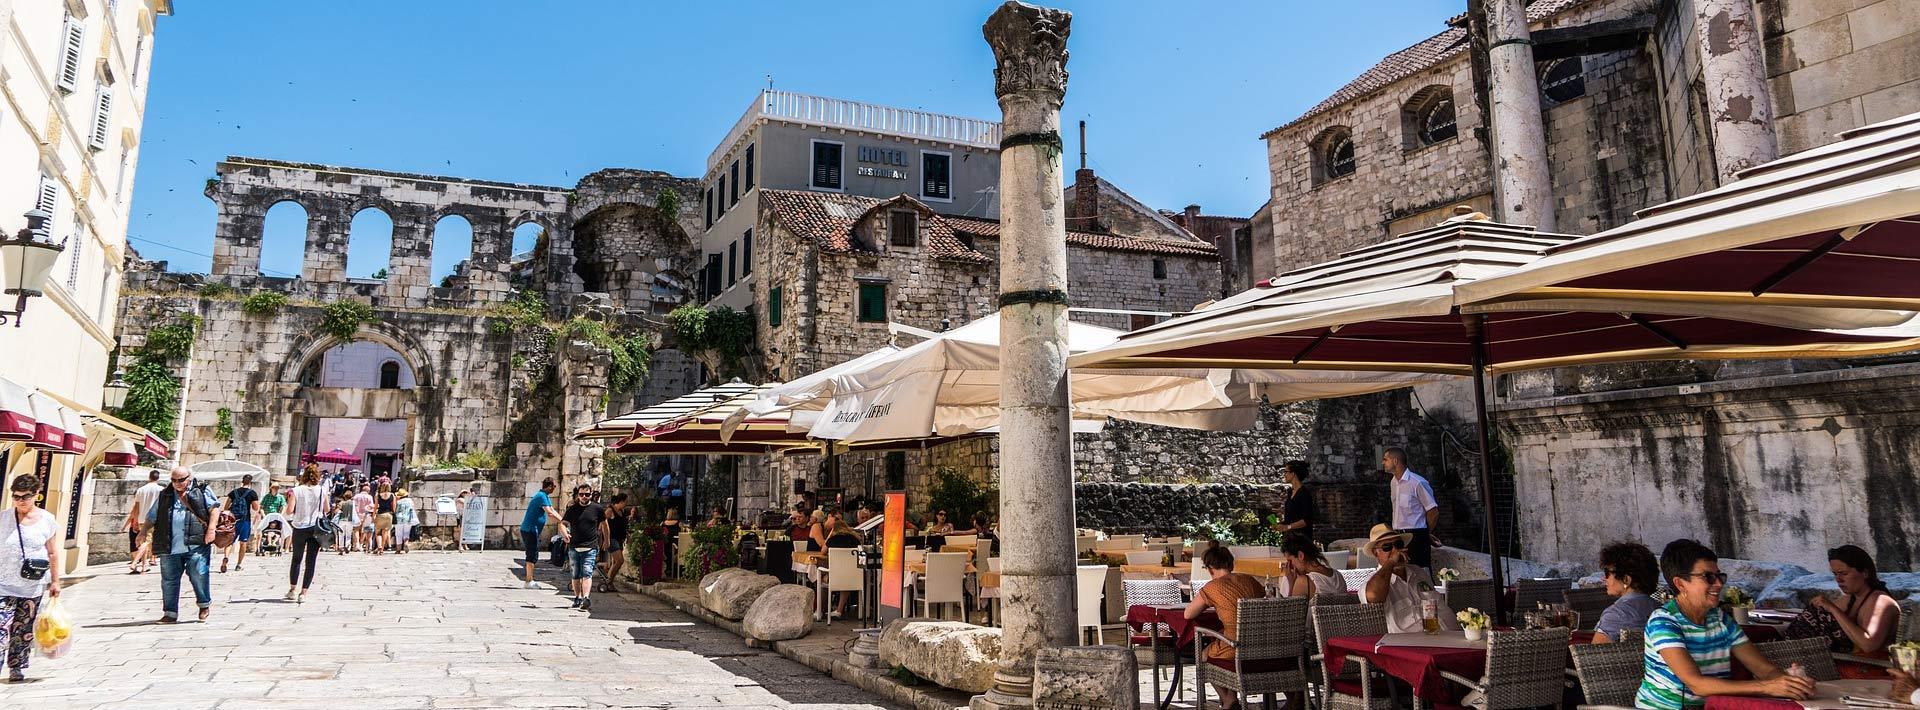 Find a parking in Split downtown